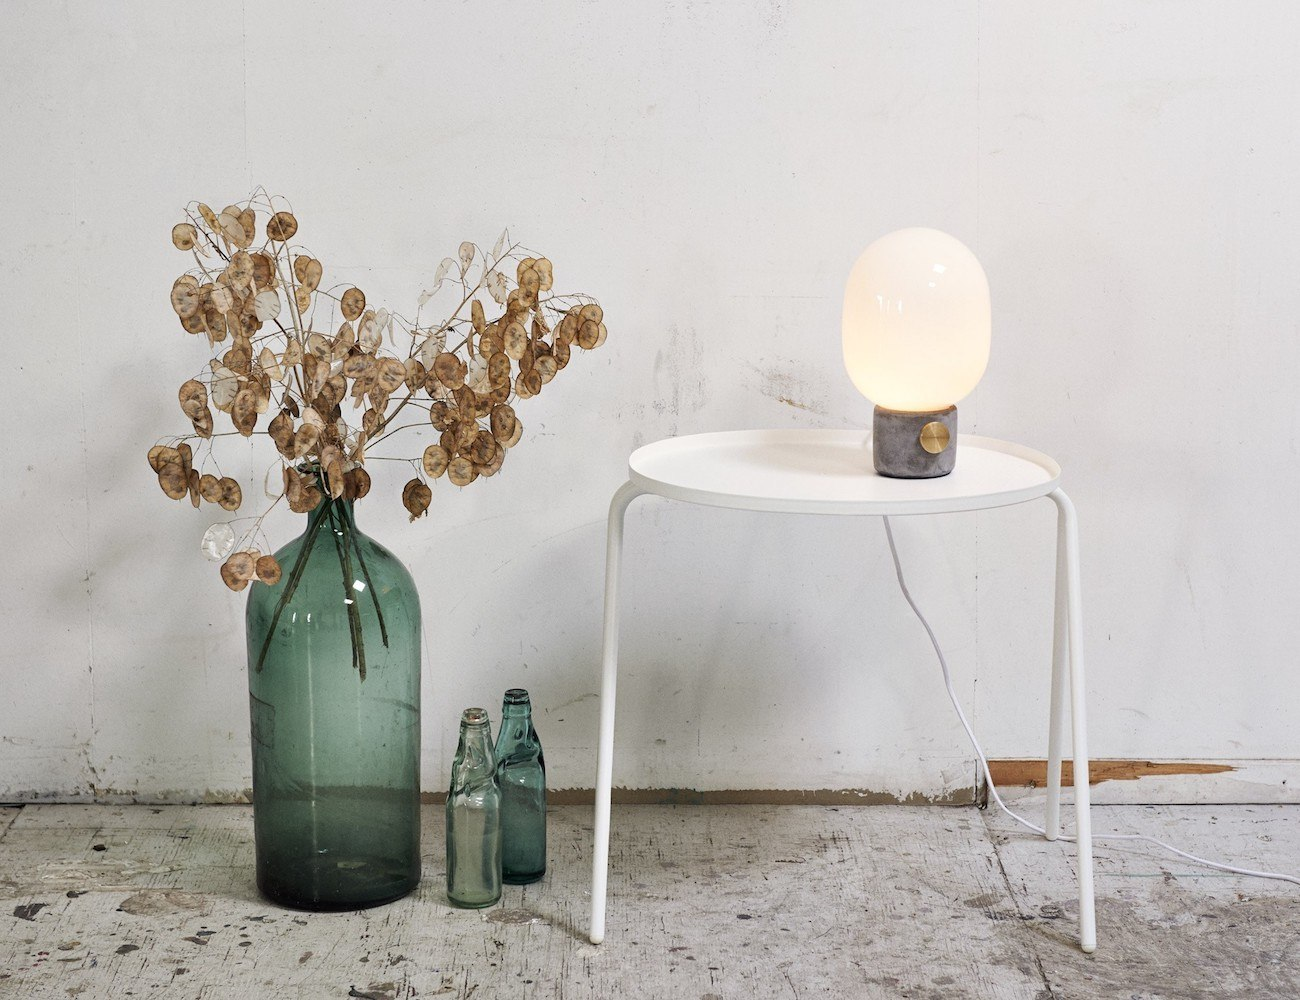 JWDA+Concrete+Table+Lamp+From+Menu